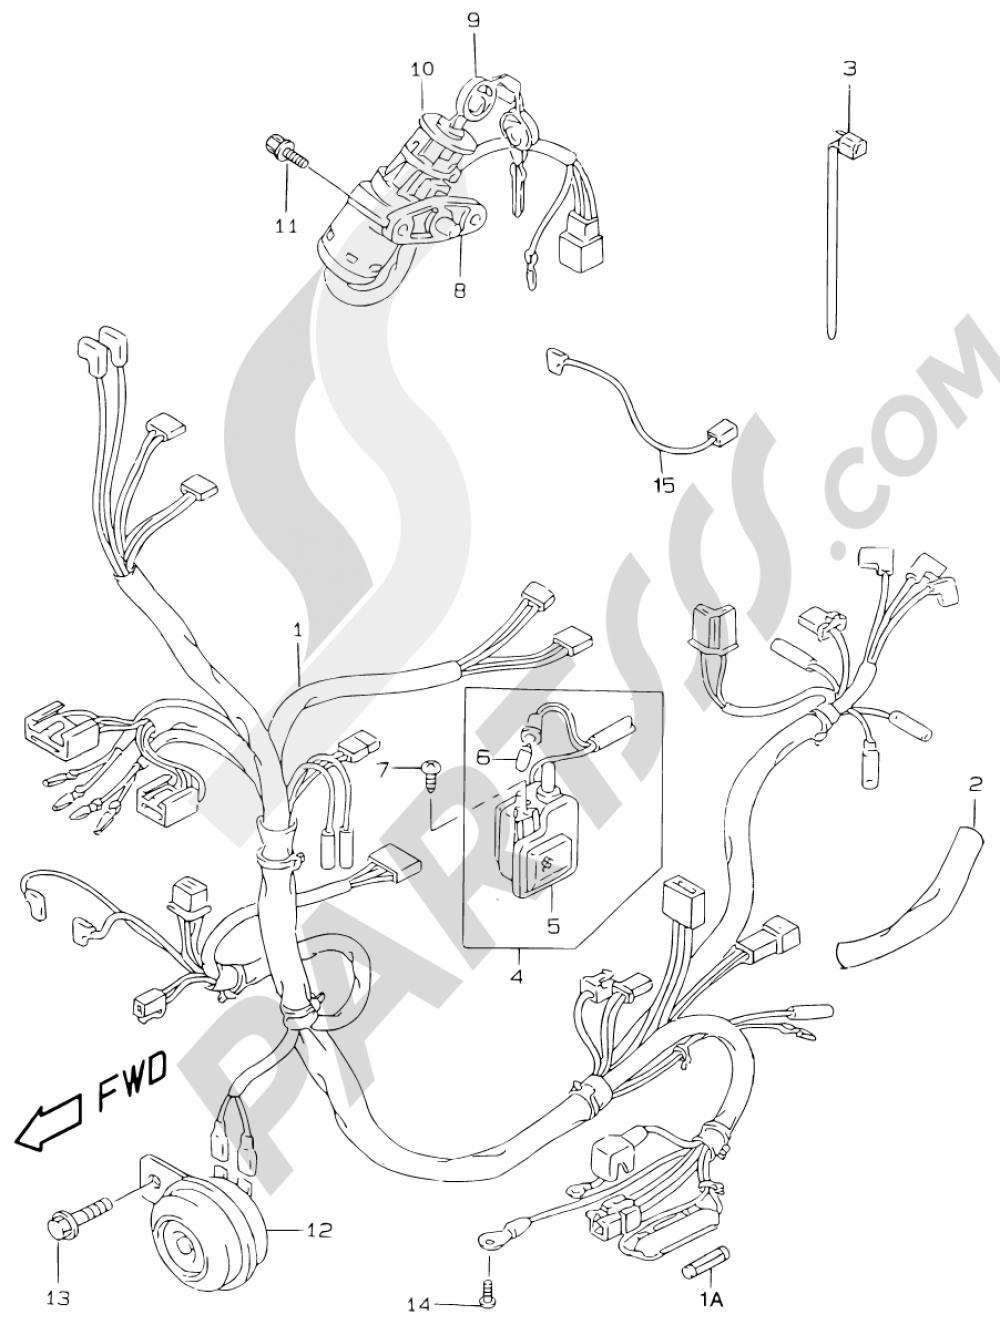 23 - WIRING HARNESS (MODEL V/W/X/Y) Suzuki KATANA AY50WR 1999